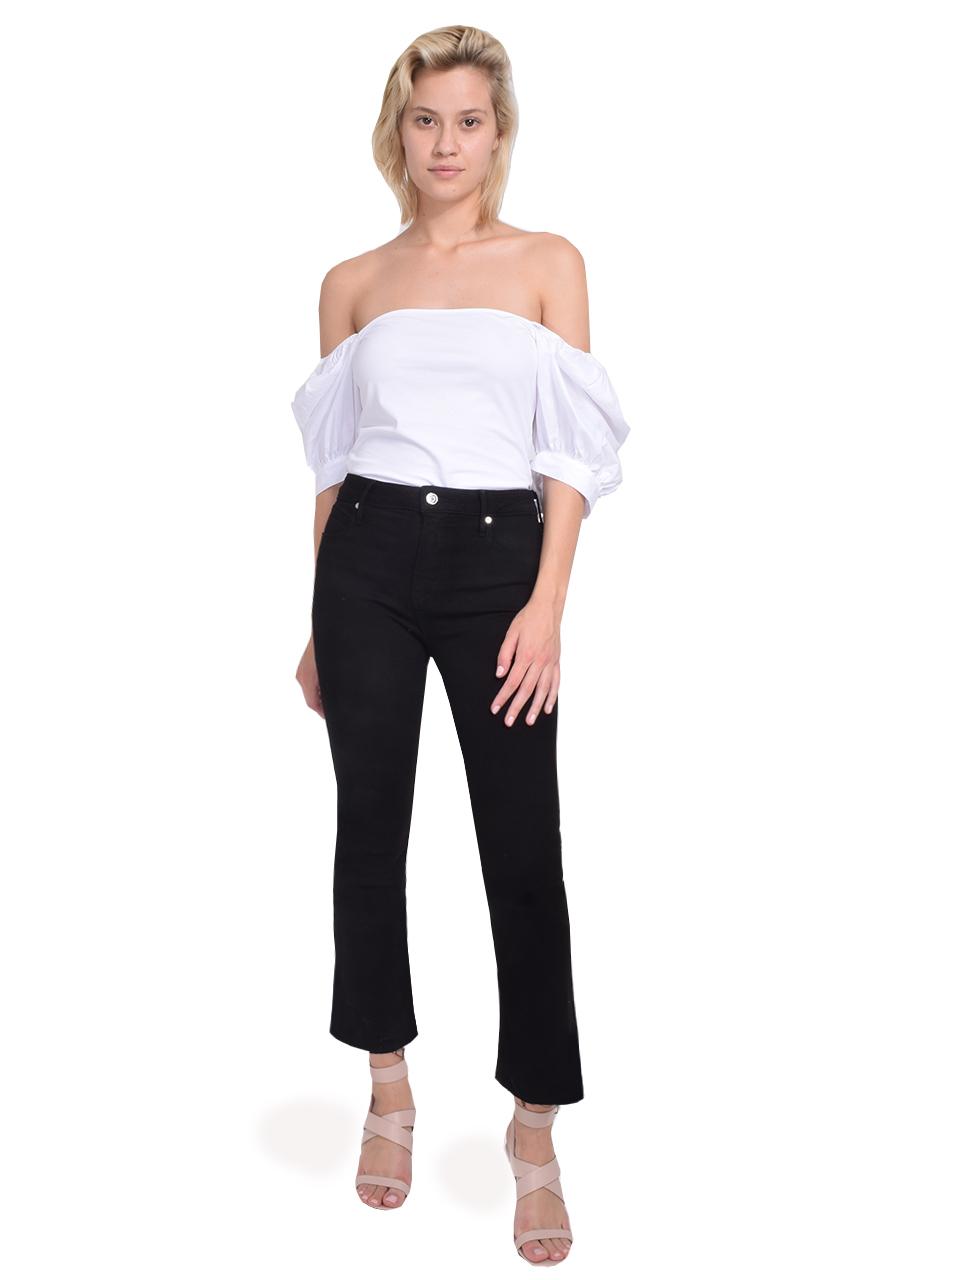 RtA Brandi Jeans in Max Black Full Outfit